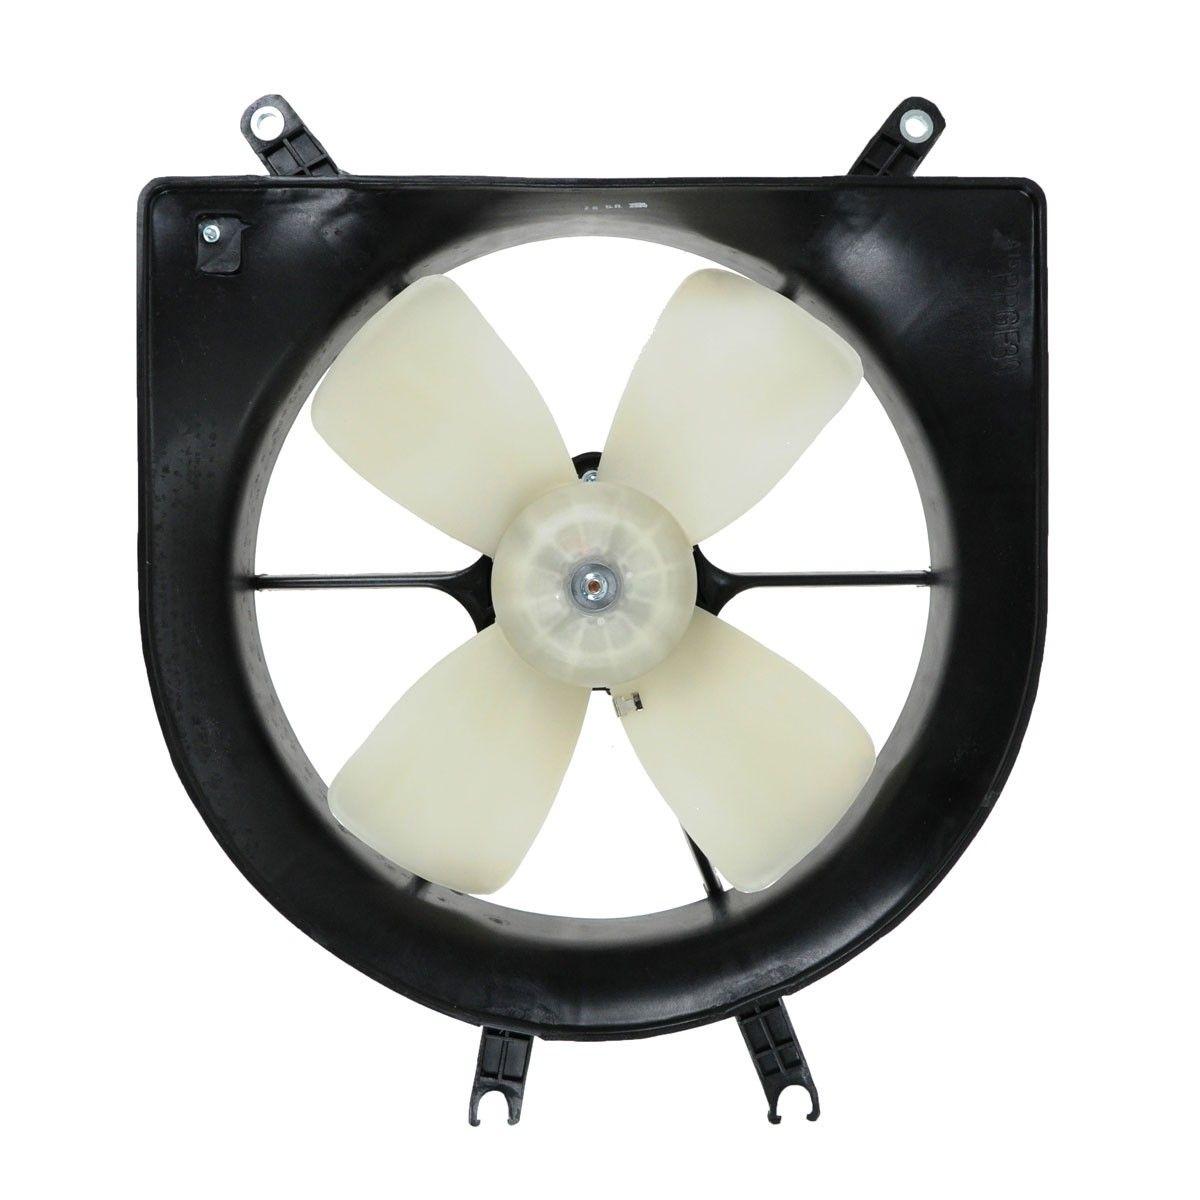 Radiator Cooling Fan Motor Assembly For Honda Civic Del Sol Ebay